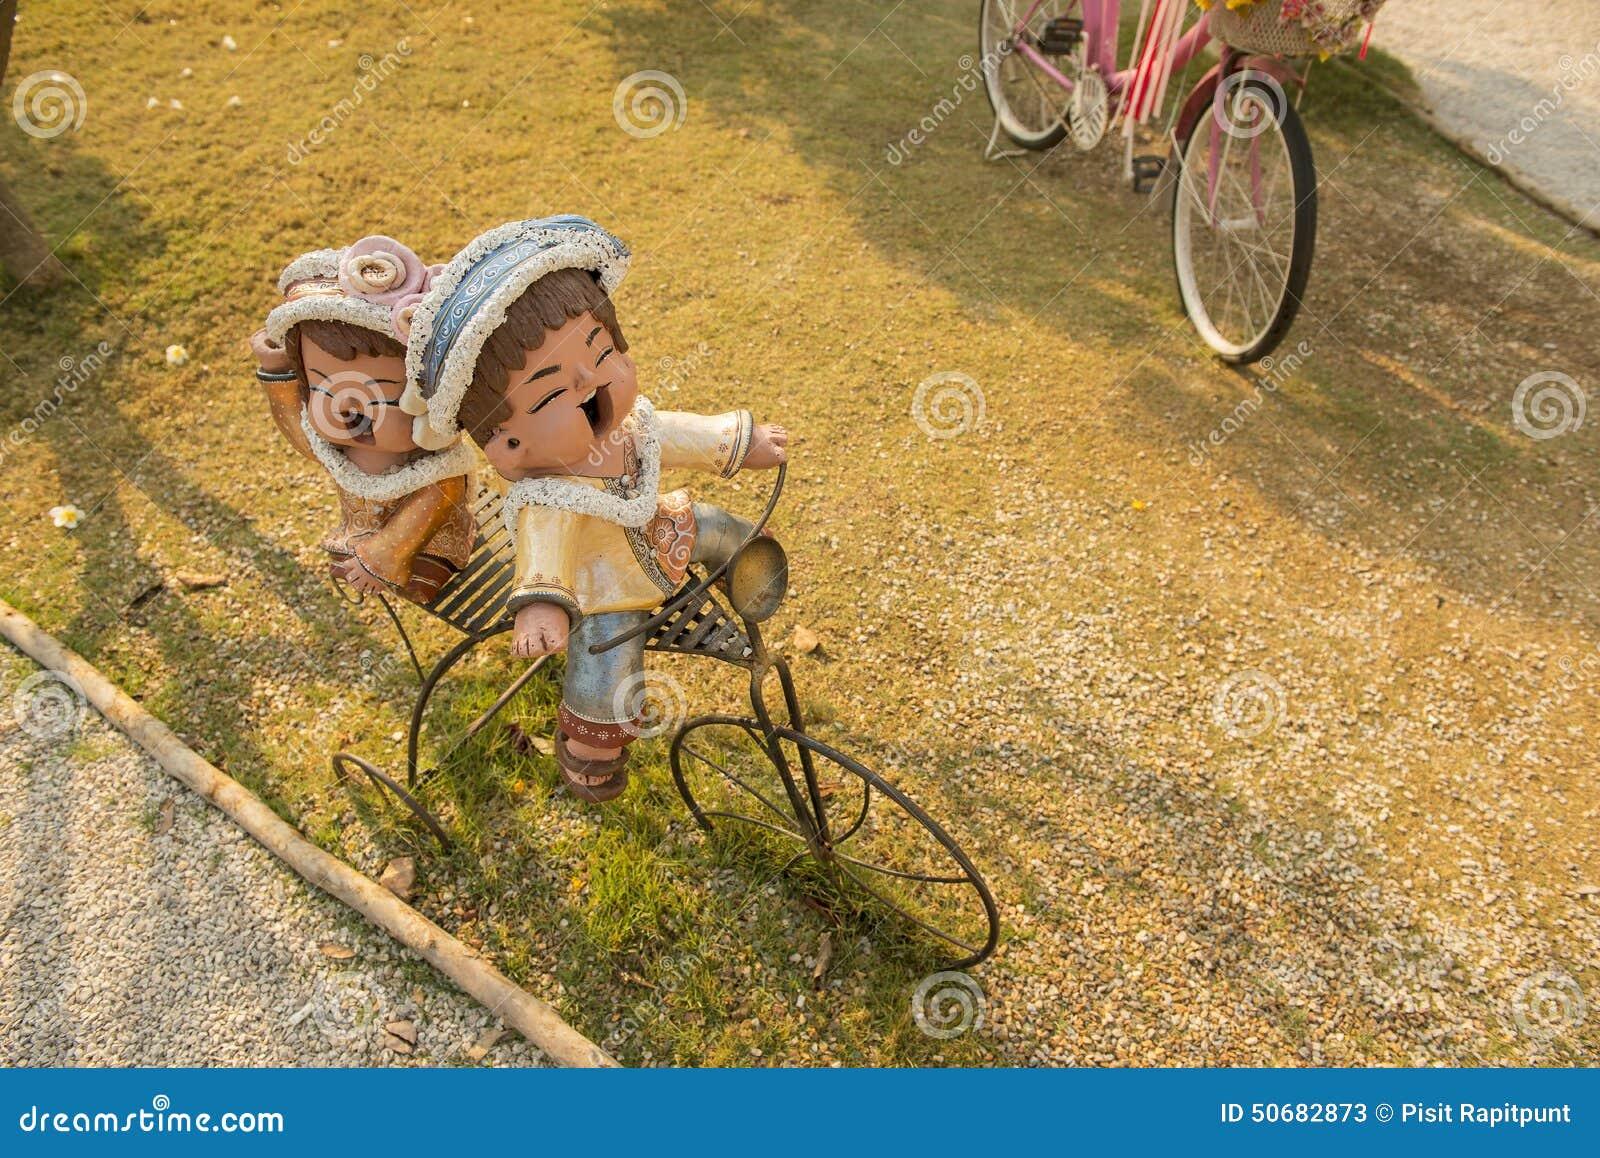 Download 关闭弯曲的钢美丽上升了在黄色公园长椅 库存例证. 插画 包括有 小雕象, 喜悦, 女孩, 瓦器, 使用, 手工制造 - 50682873